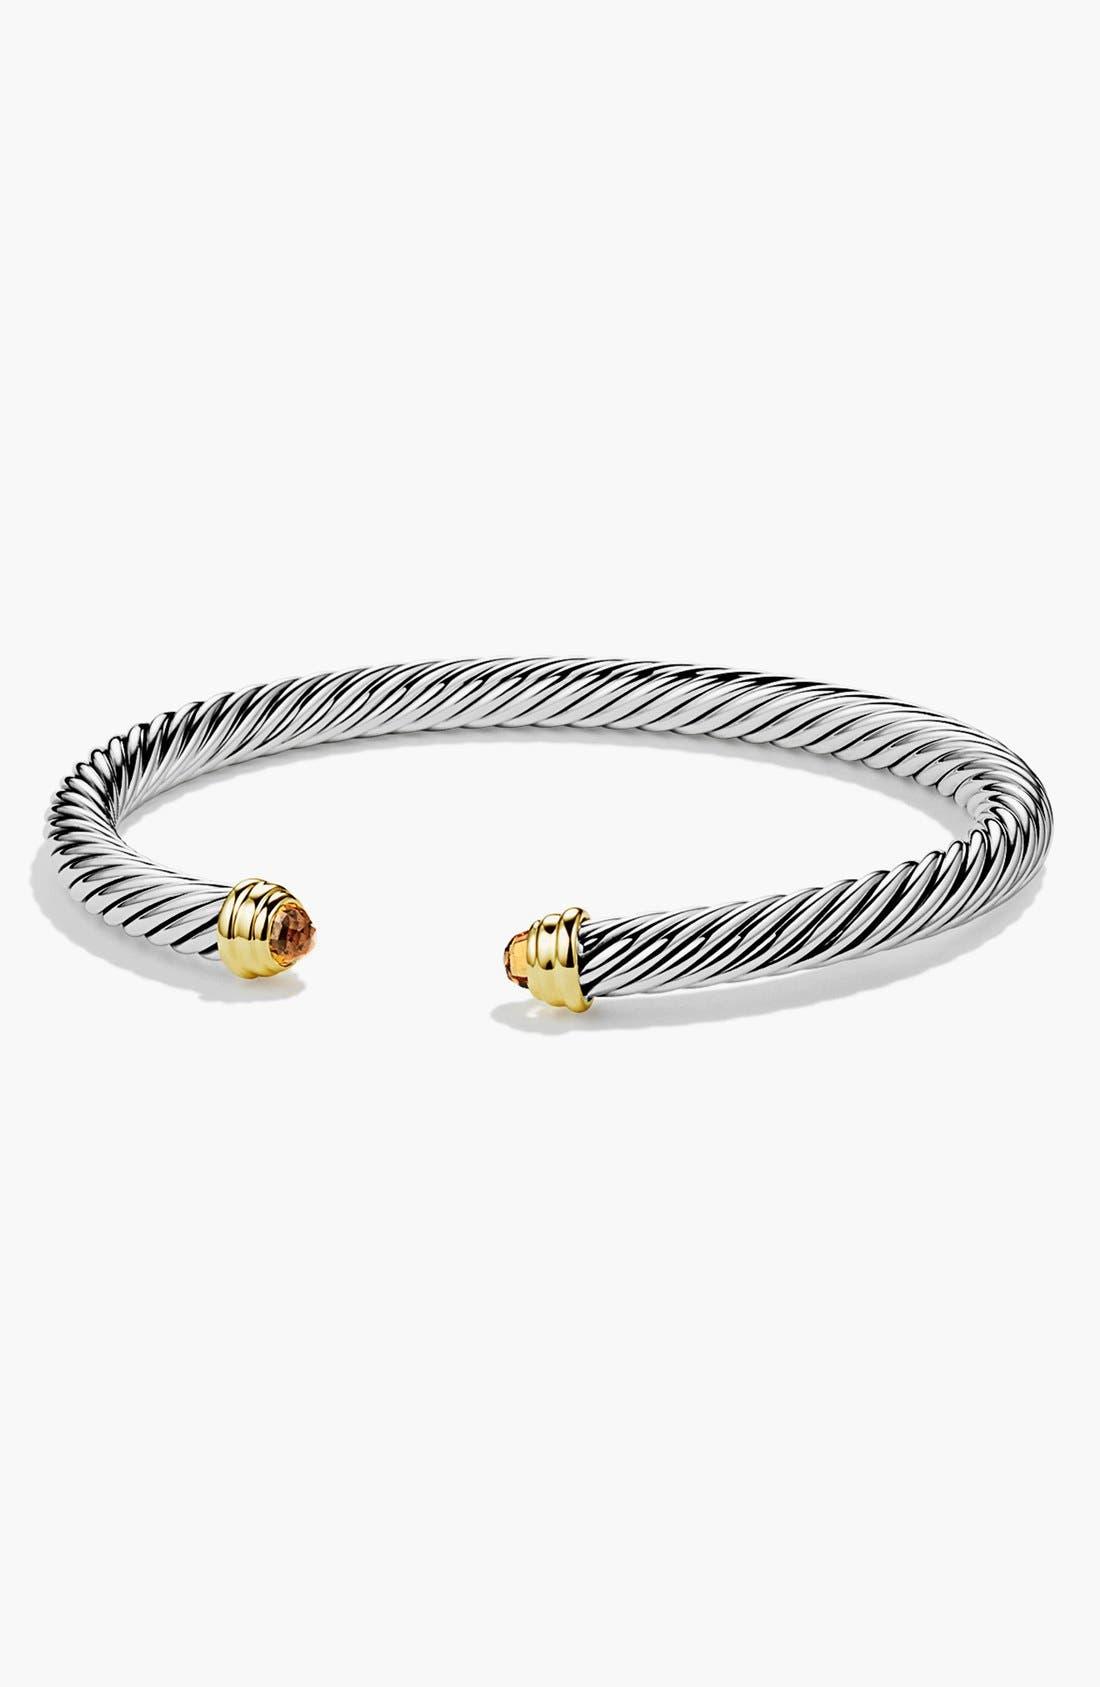 Main Image - David Yurman 'Cable Classics' Bracelet with Semiprecious Stones & Gold